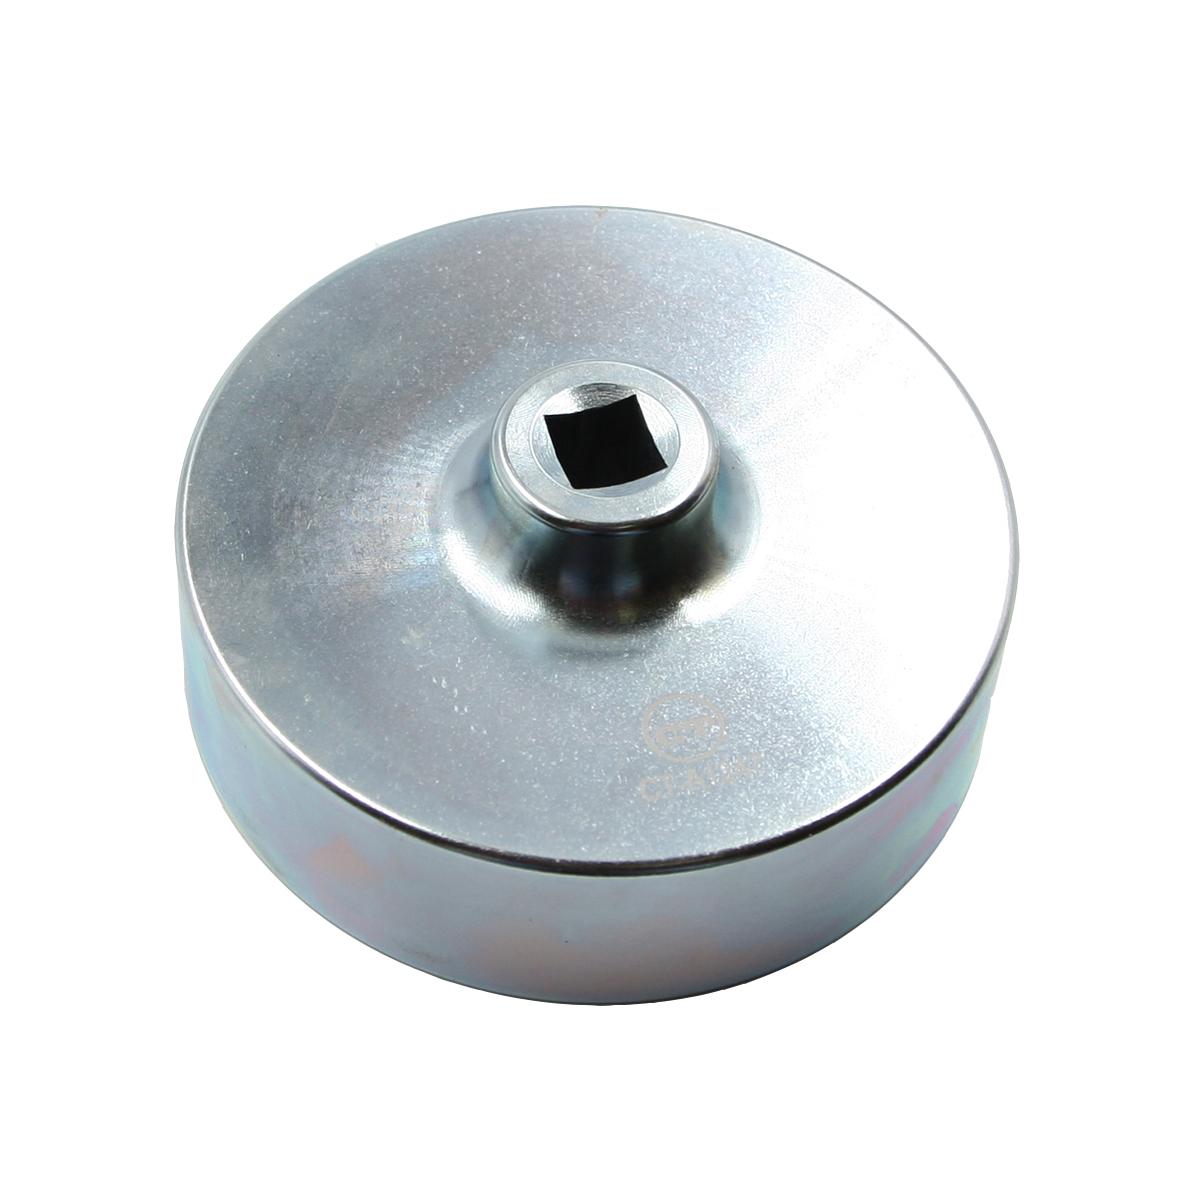 Ключ масляного фильтра Volvo 107 мм